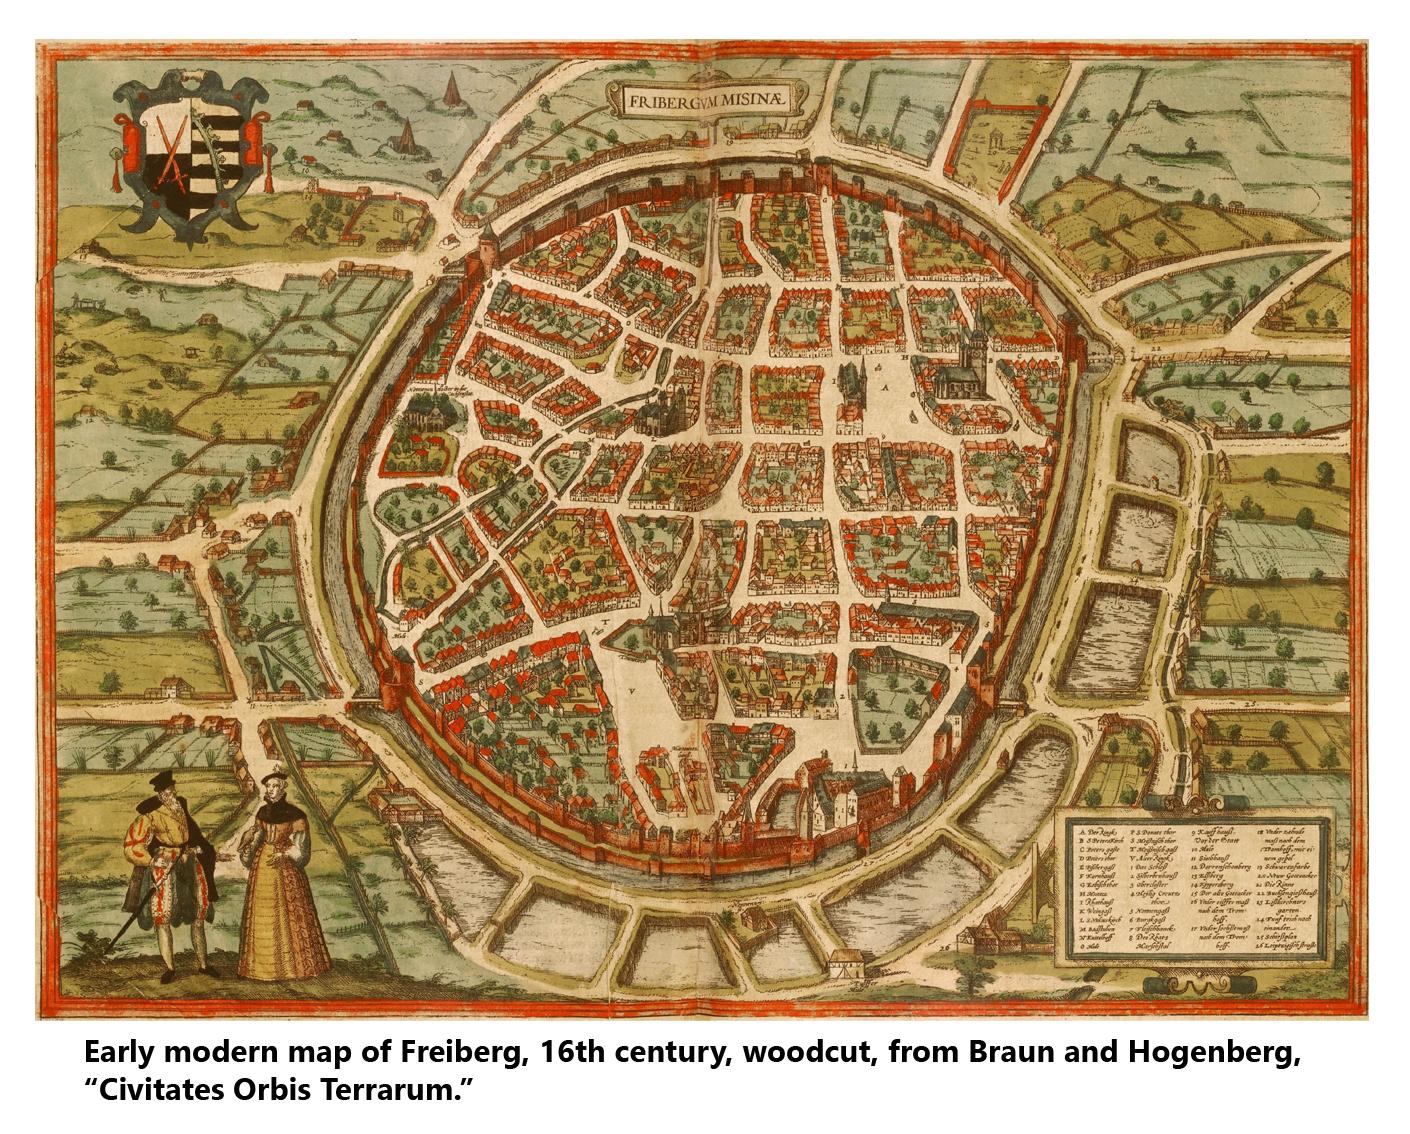 Map of Freiberg